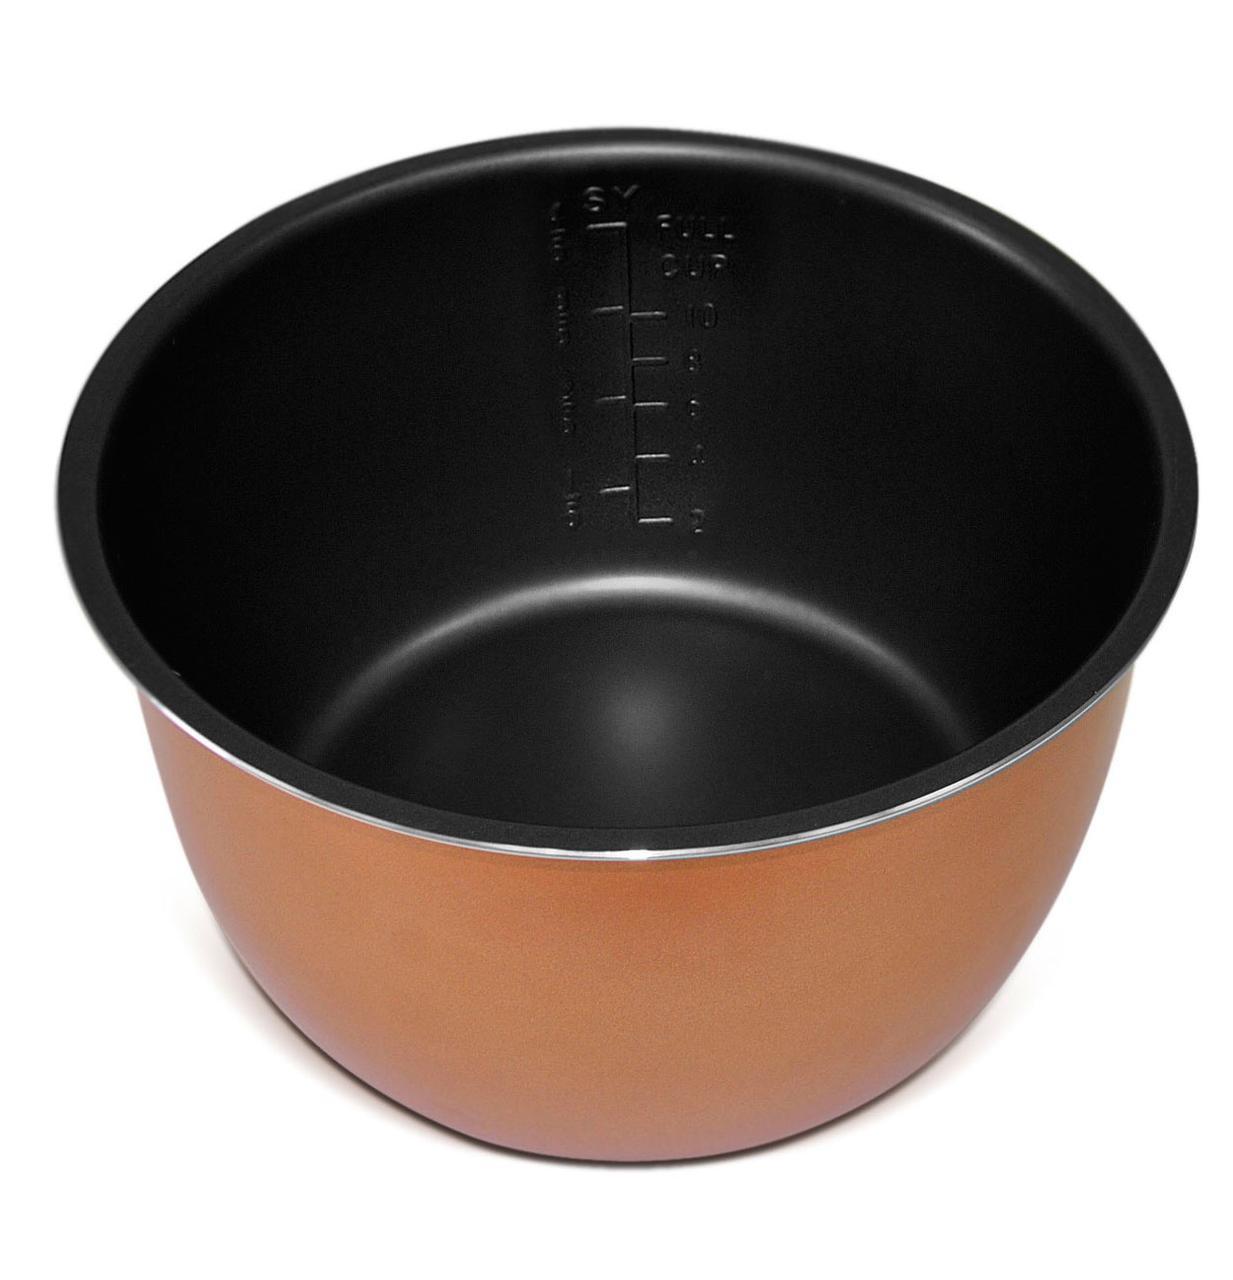 Чаша (кастрюля) для мультиварки 5 л Redmond - УЦЕНКА!